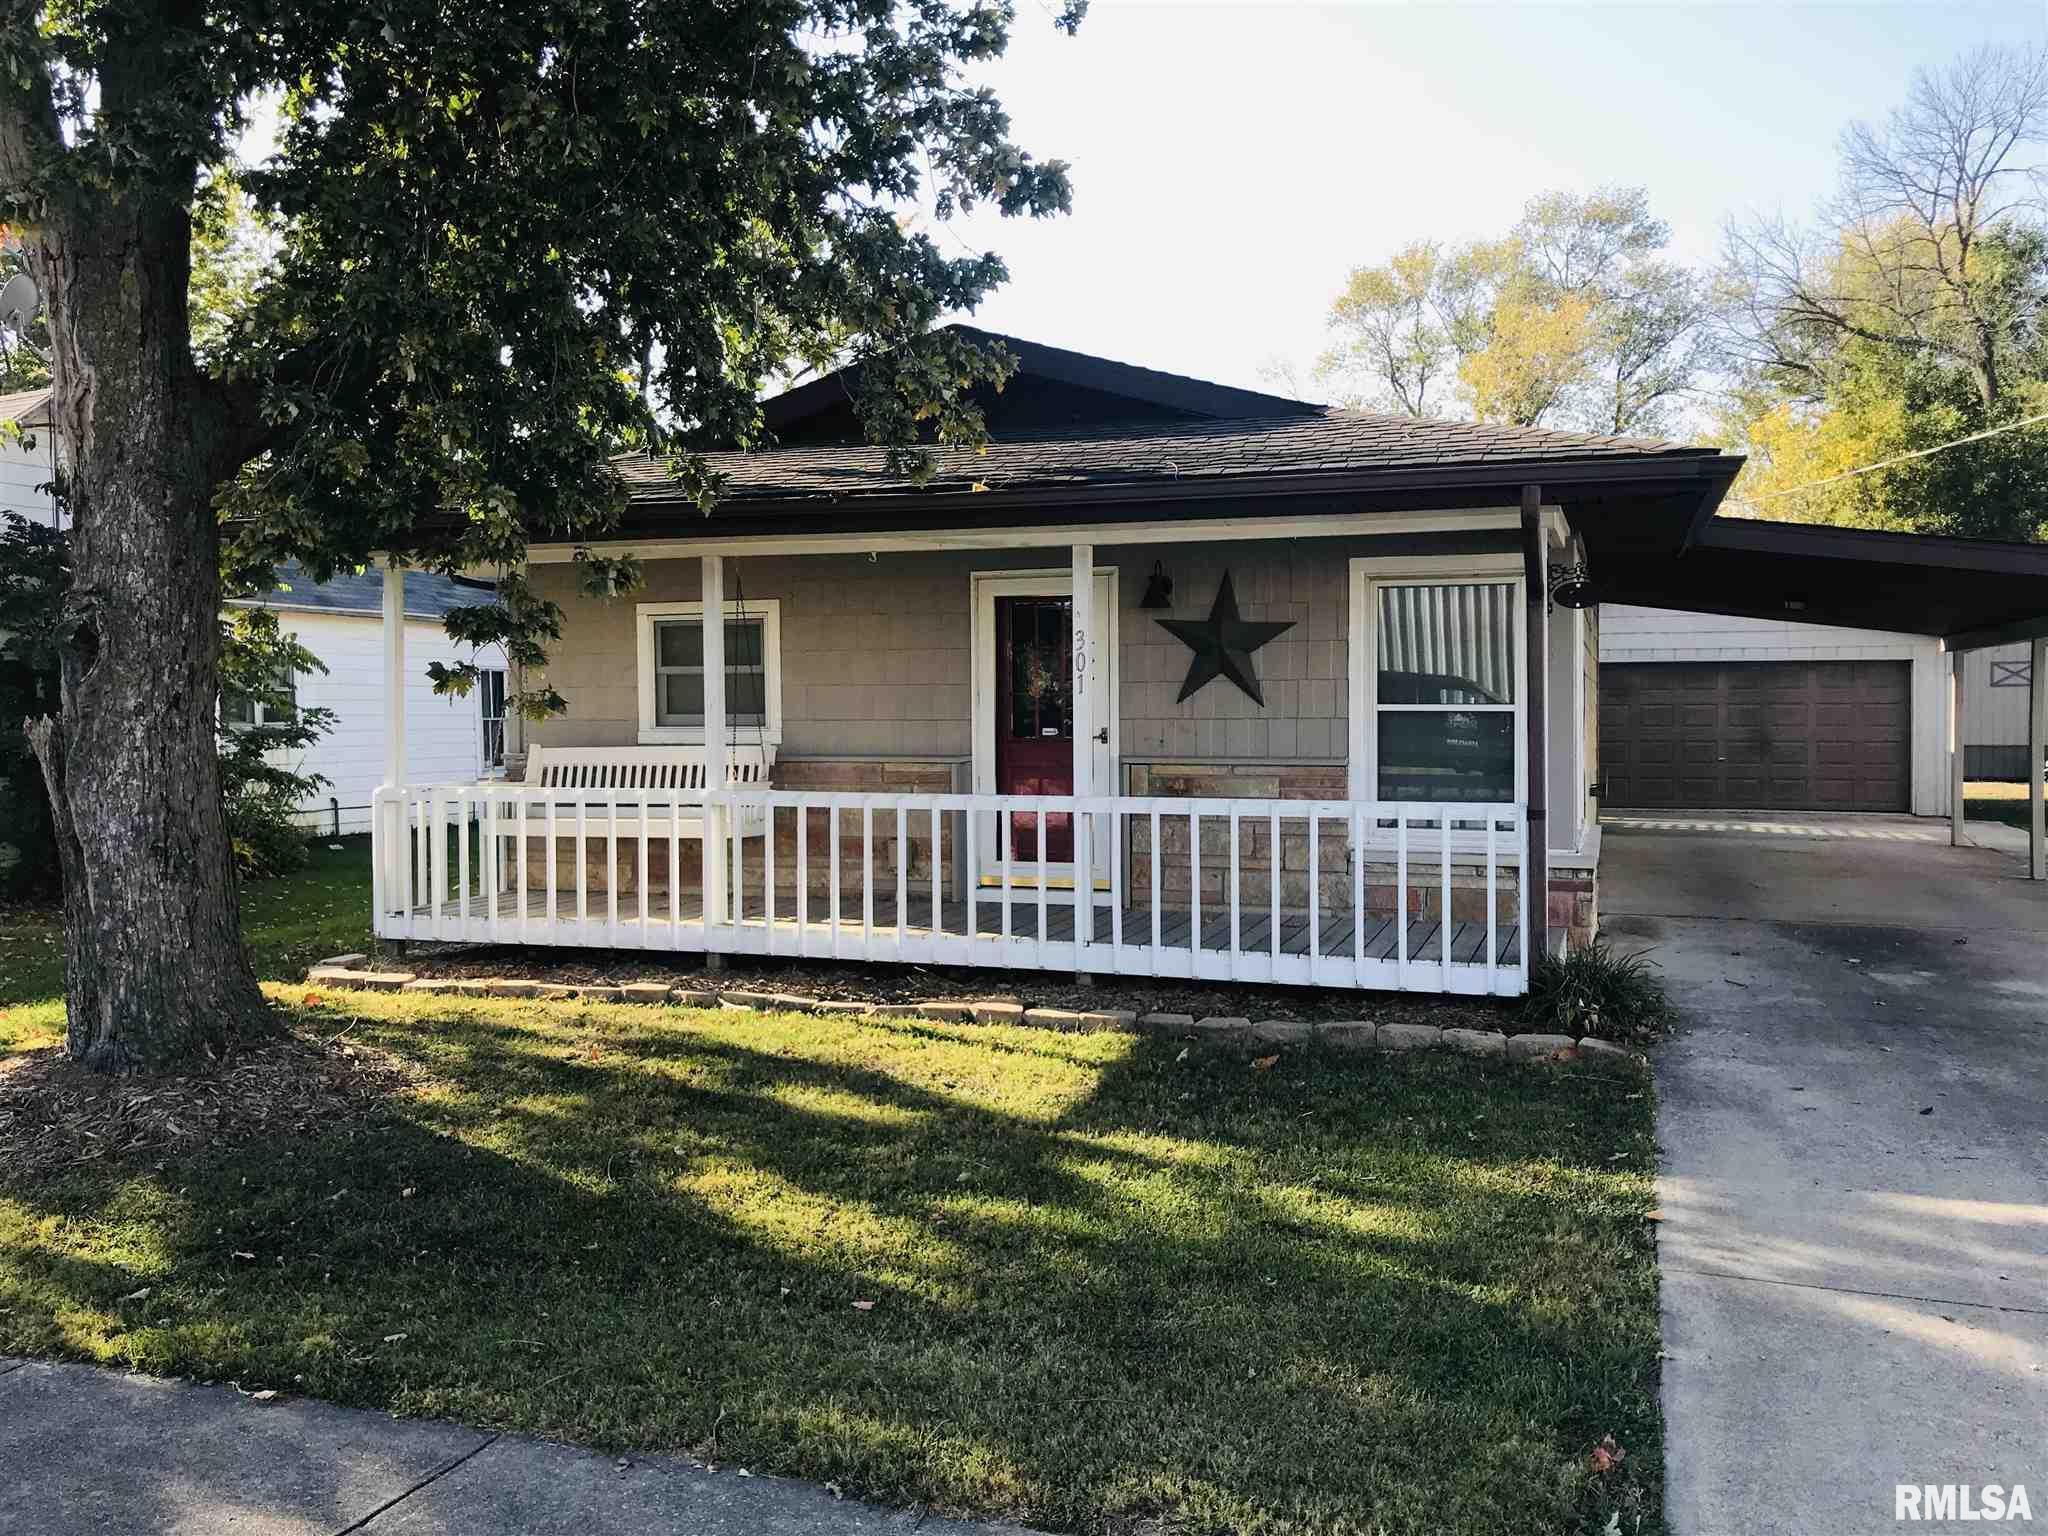 301 S WALNUT Property Photo - Farina, IL real estate listing